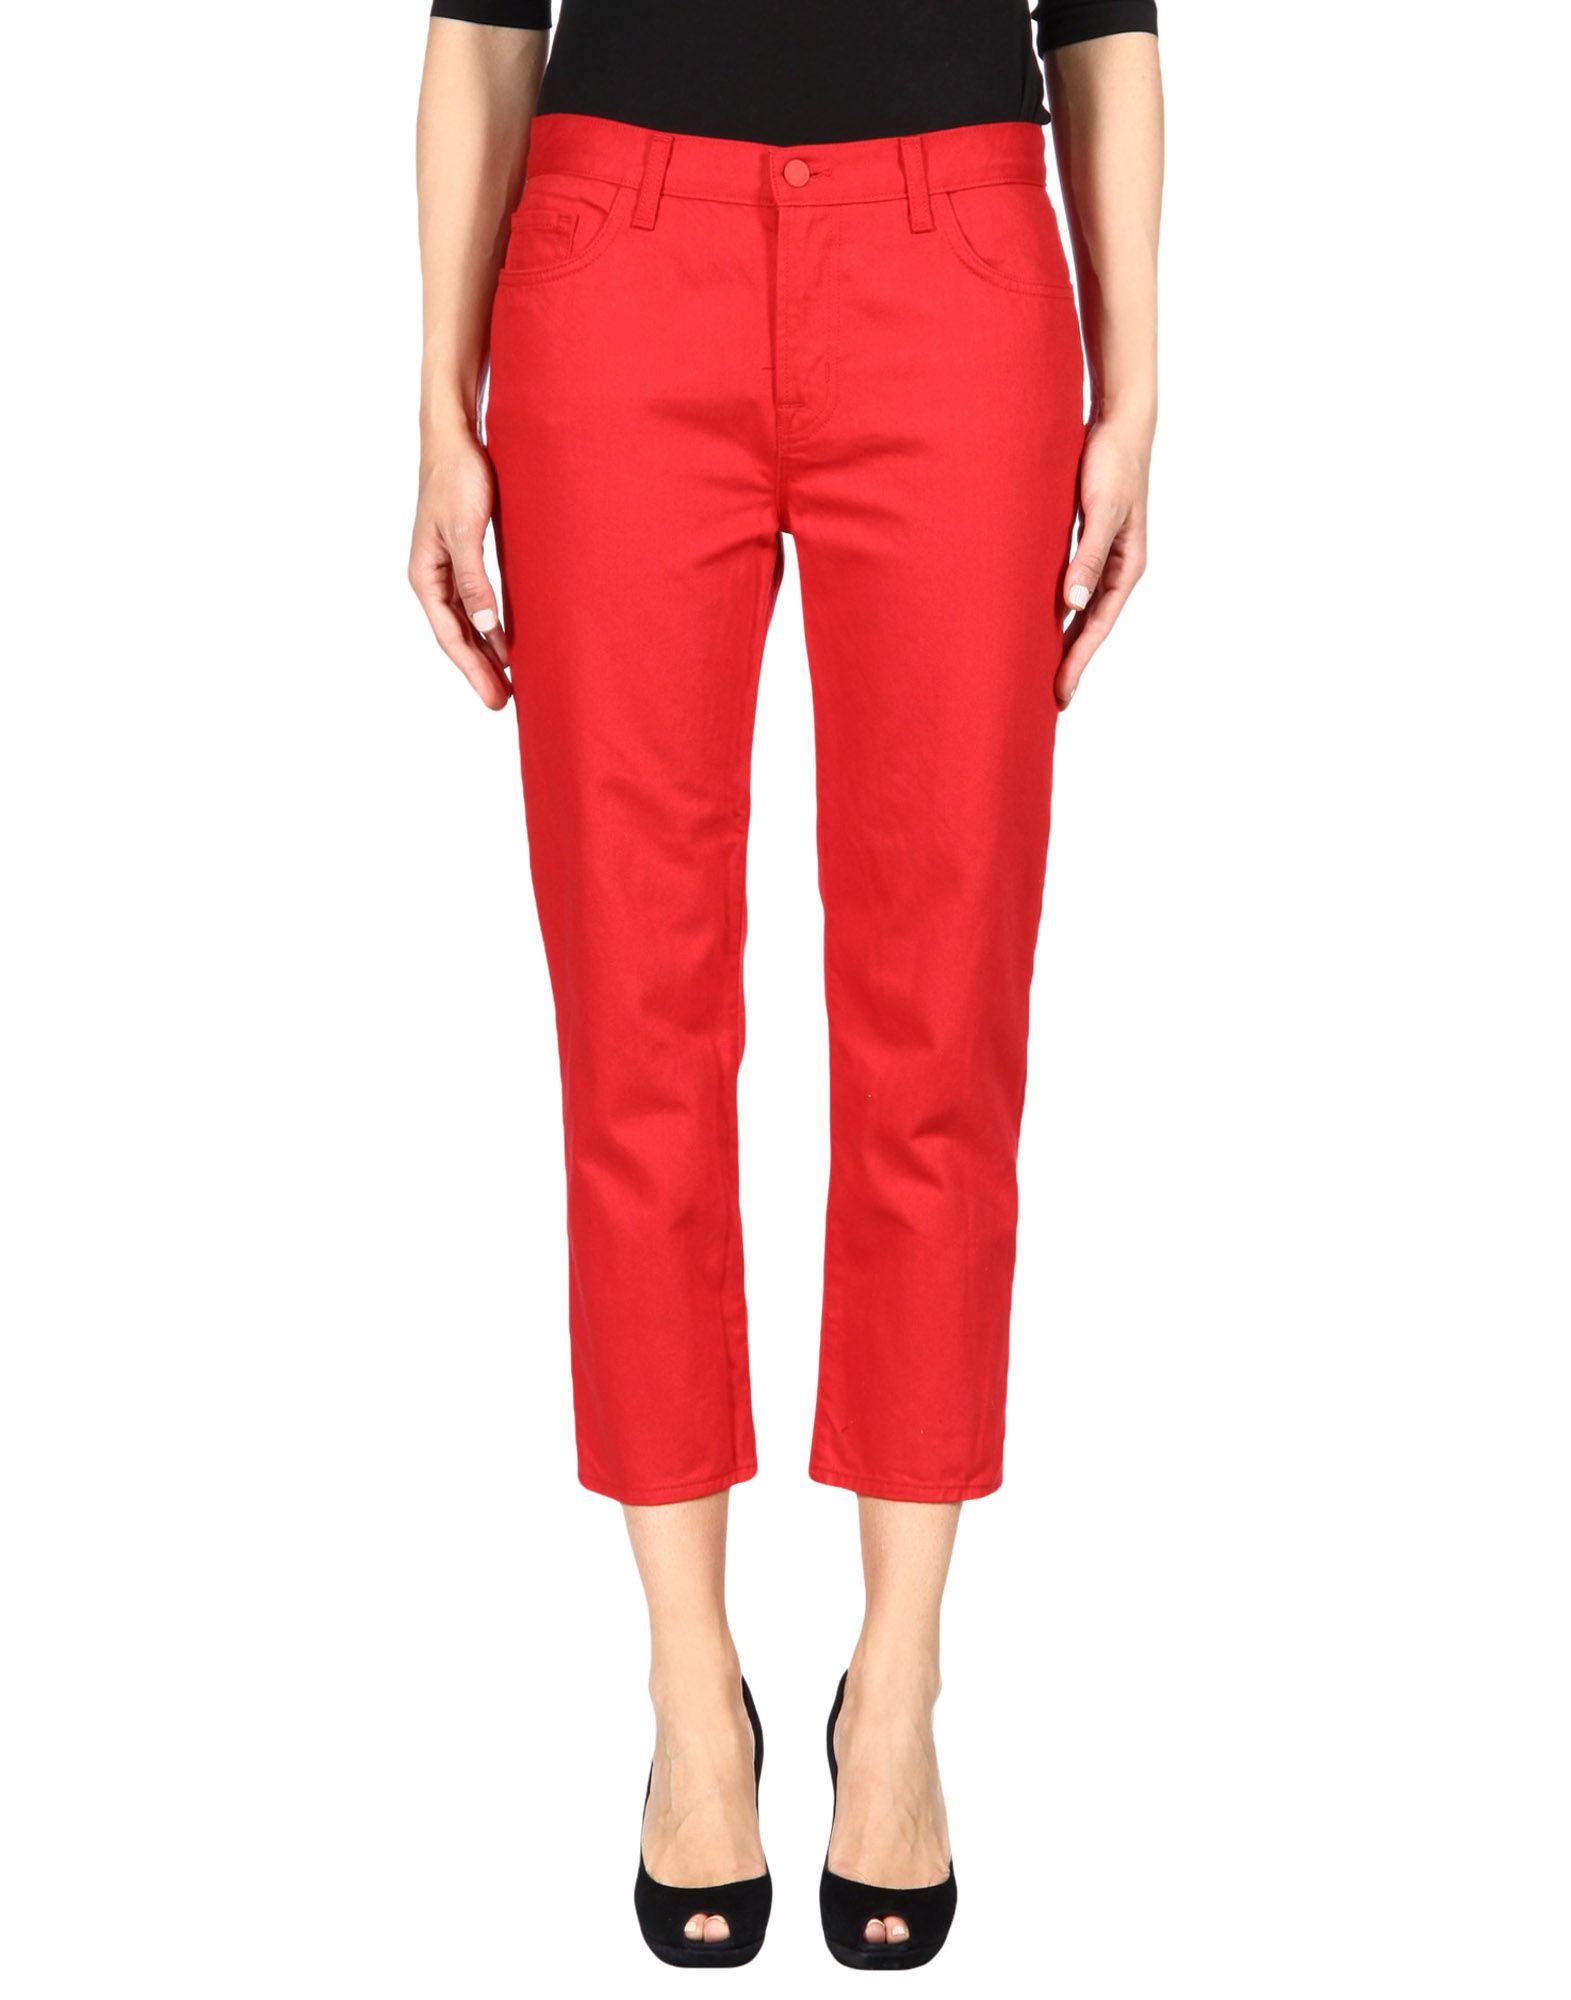 SIMONE ROCHA X J BRAND Denim Pants in Red